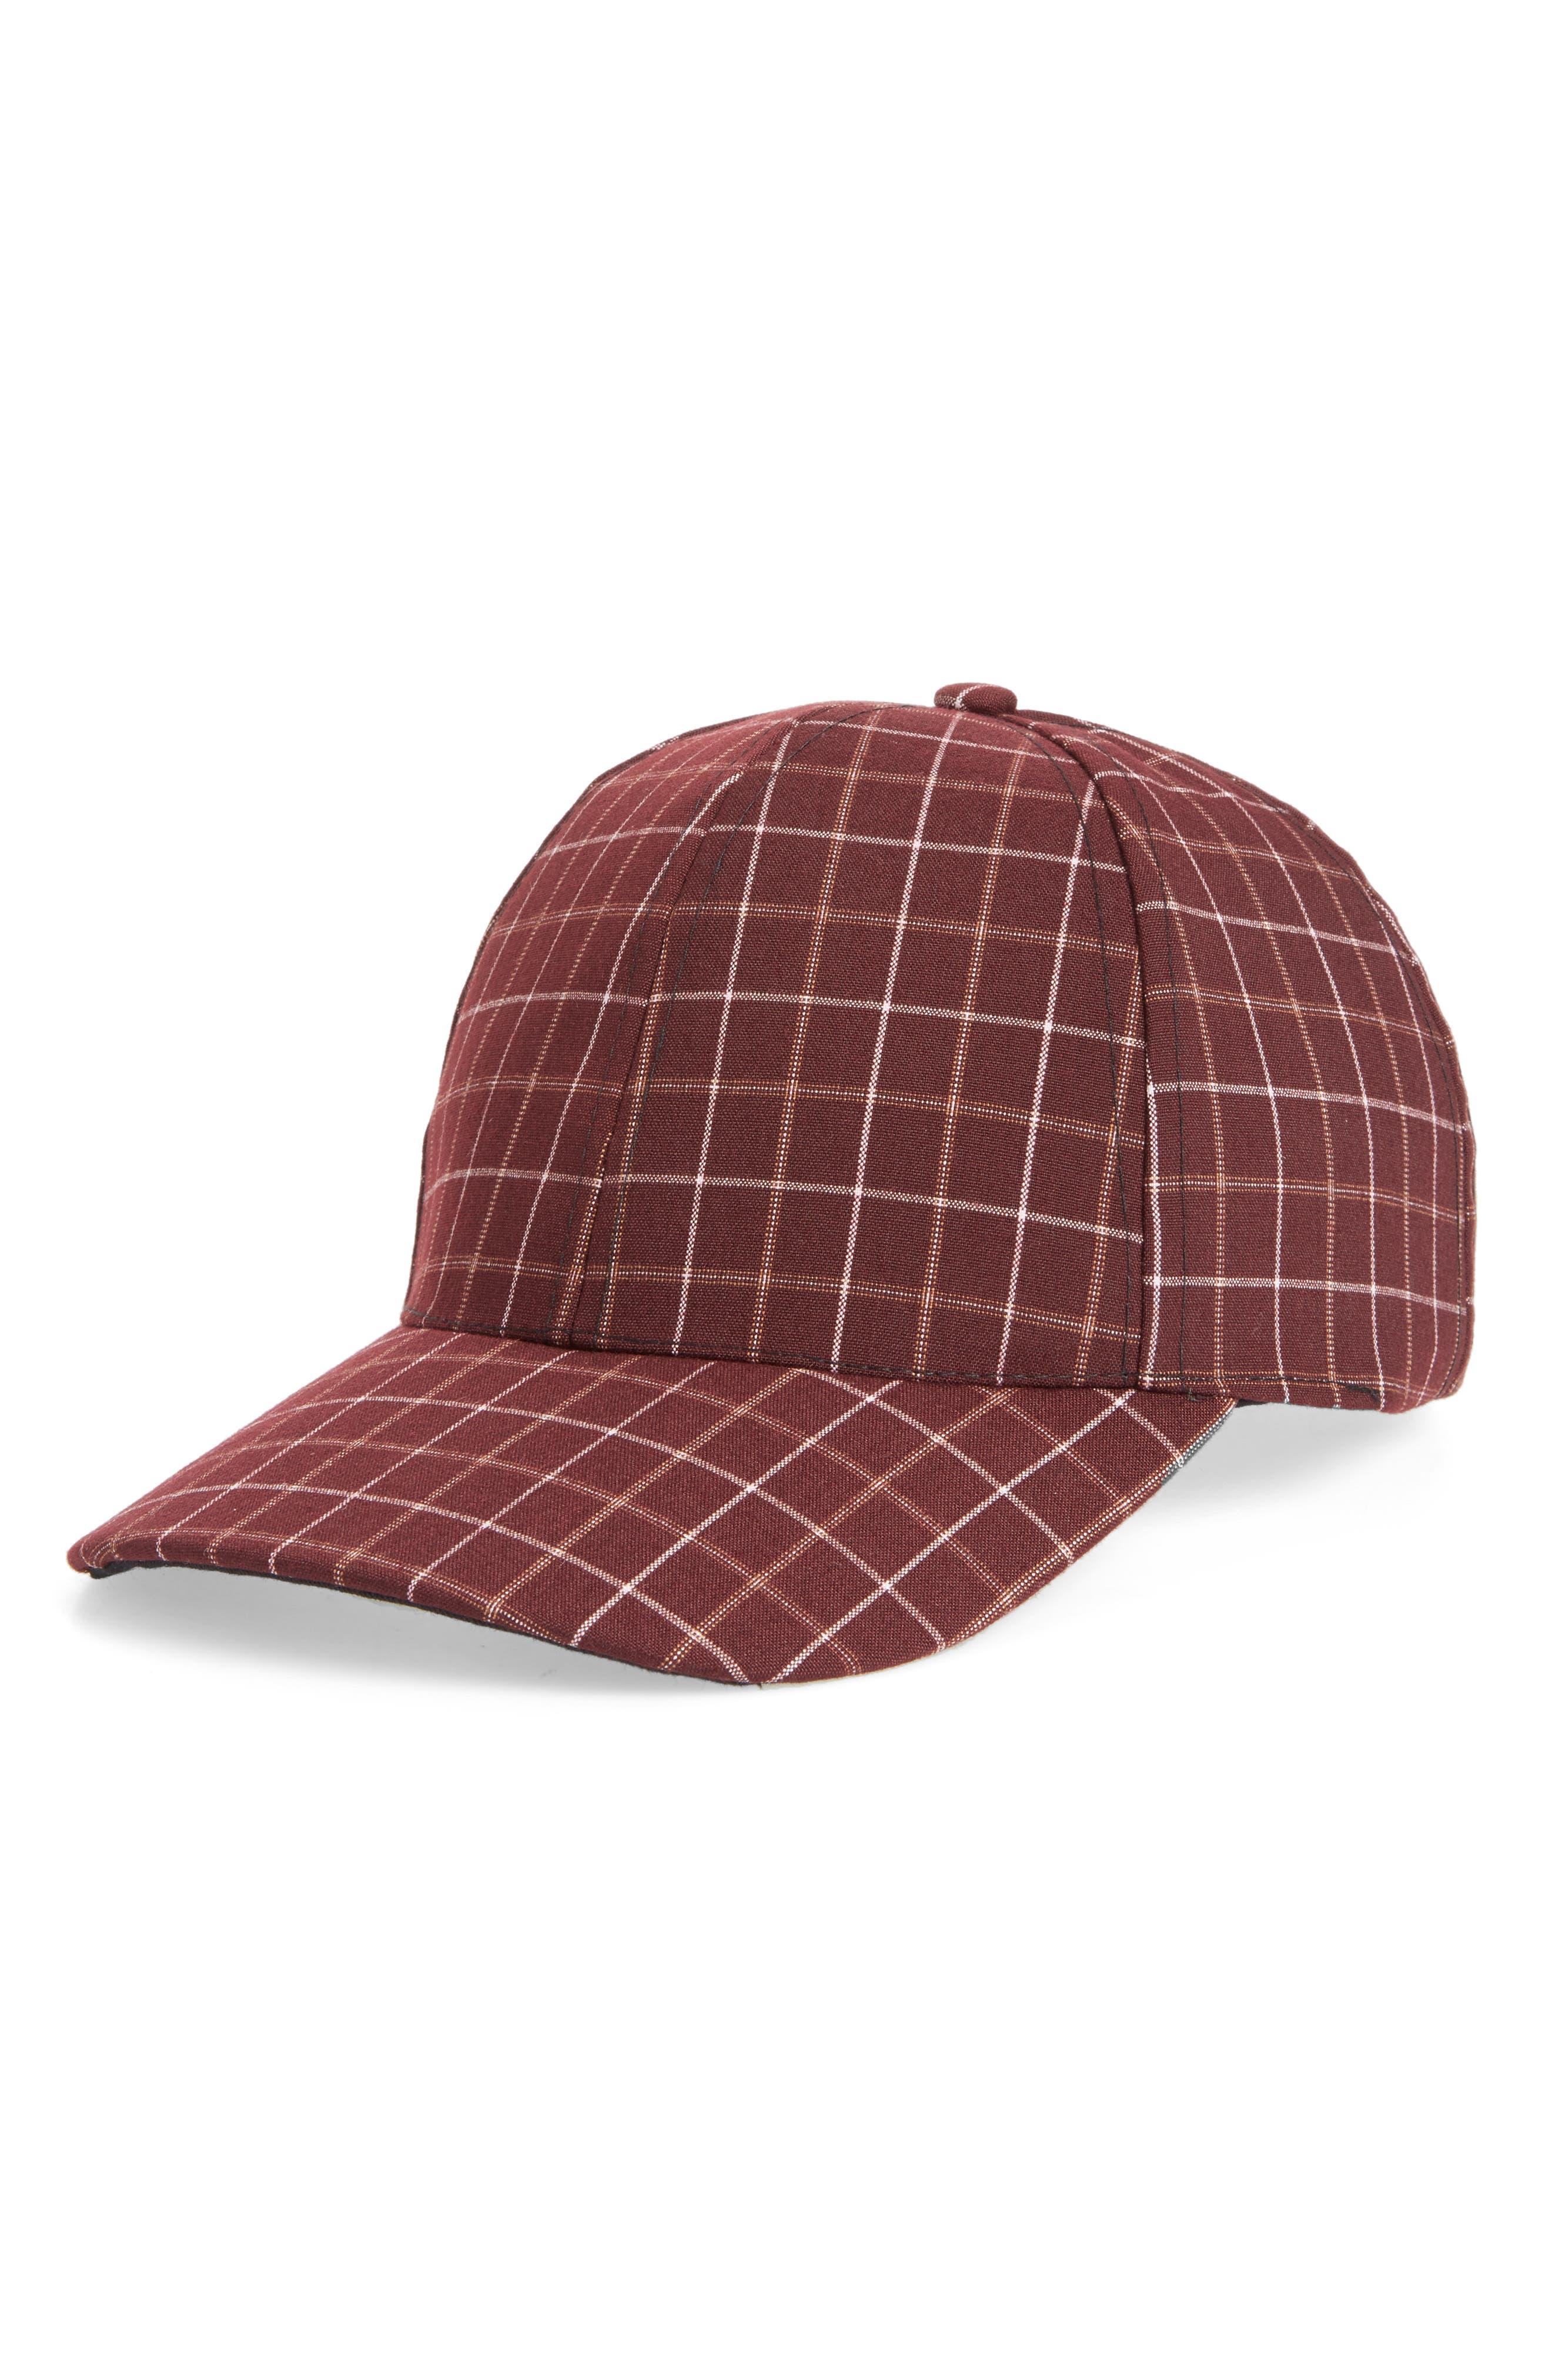 Windowpane Baseball Cap,                         Main,                         color, Burgundy